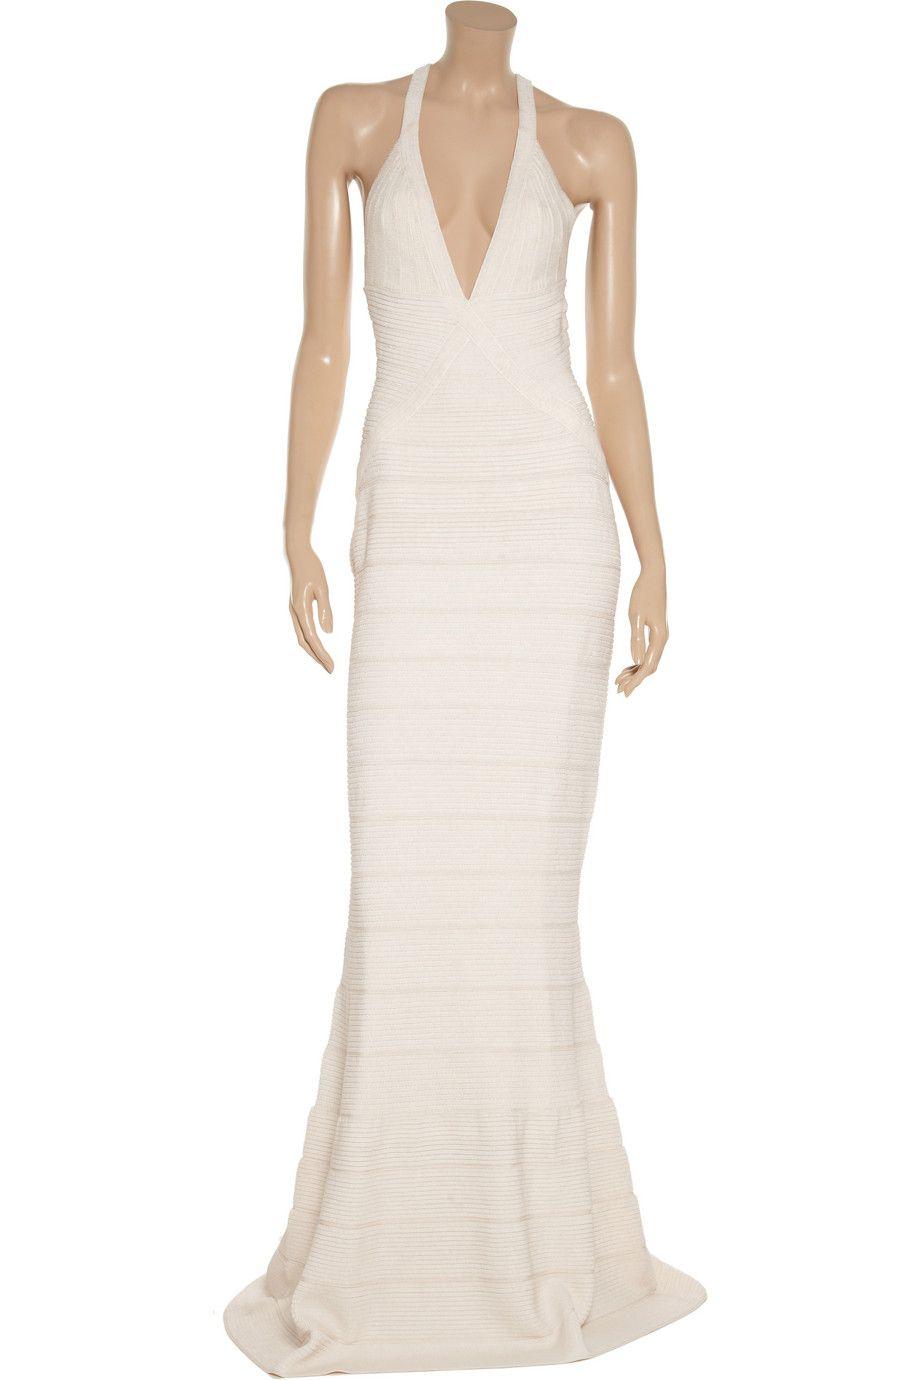 Hervé léger beaded bandage gown threads pinterest designer dresses